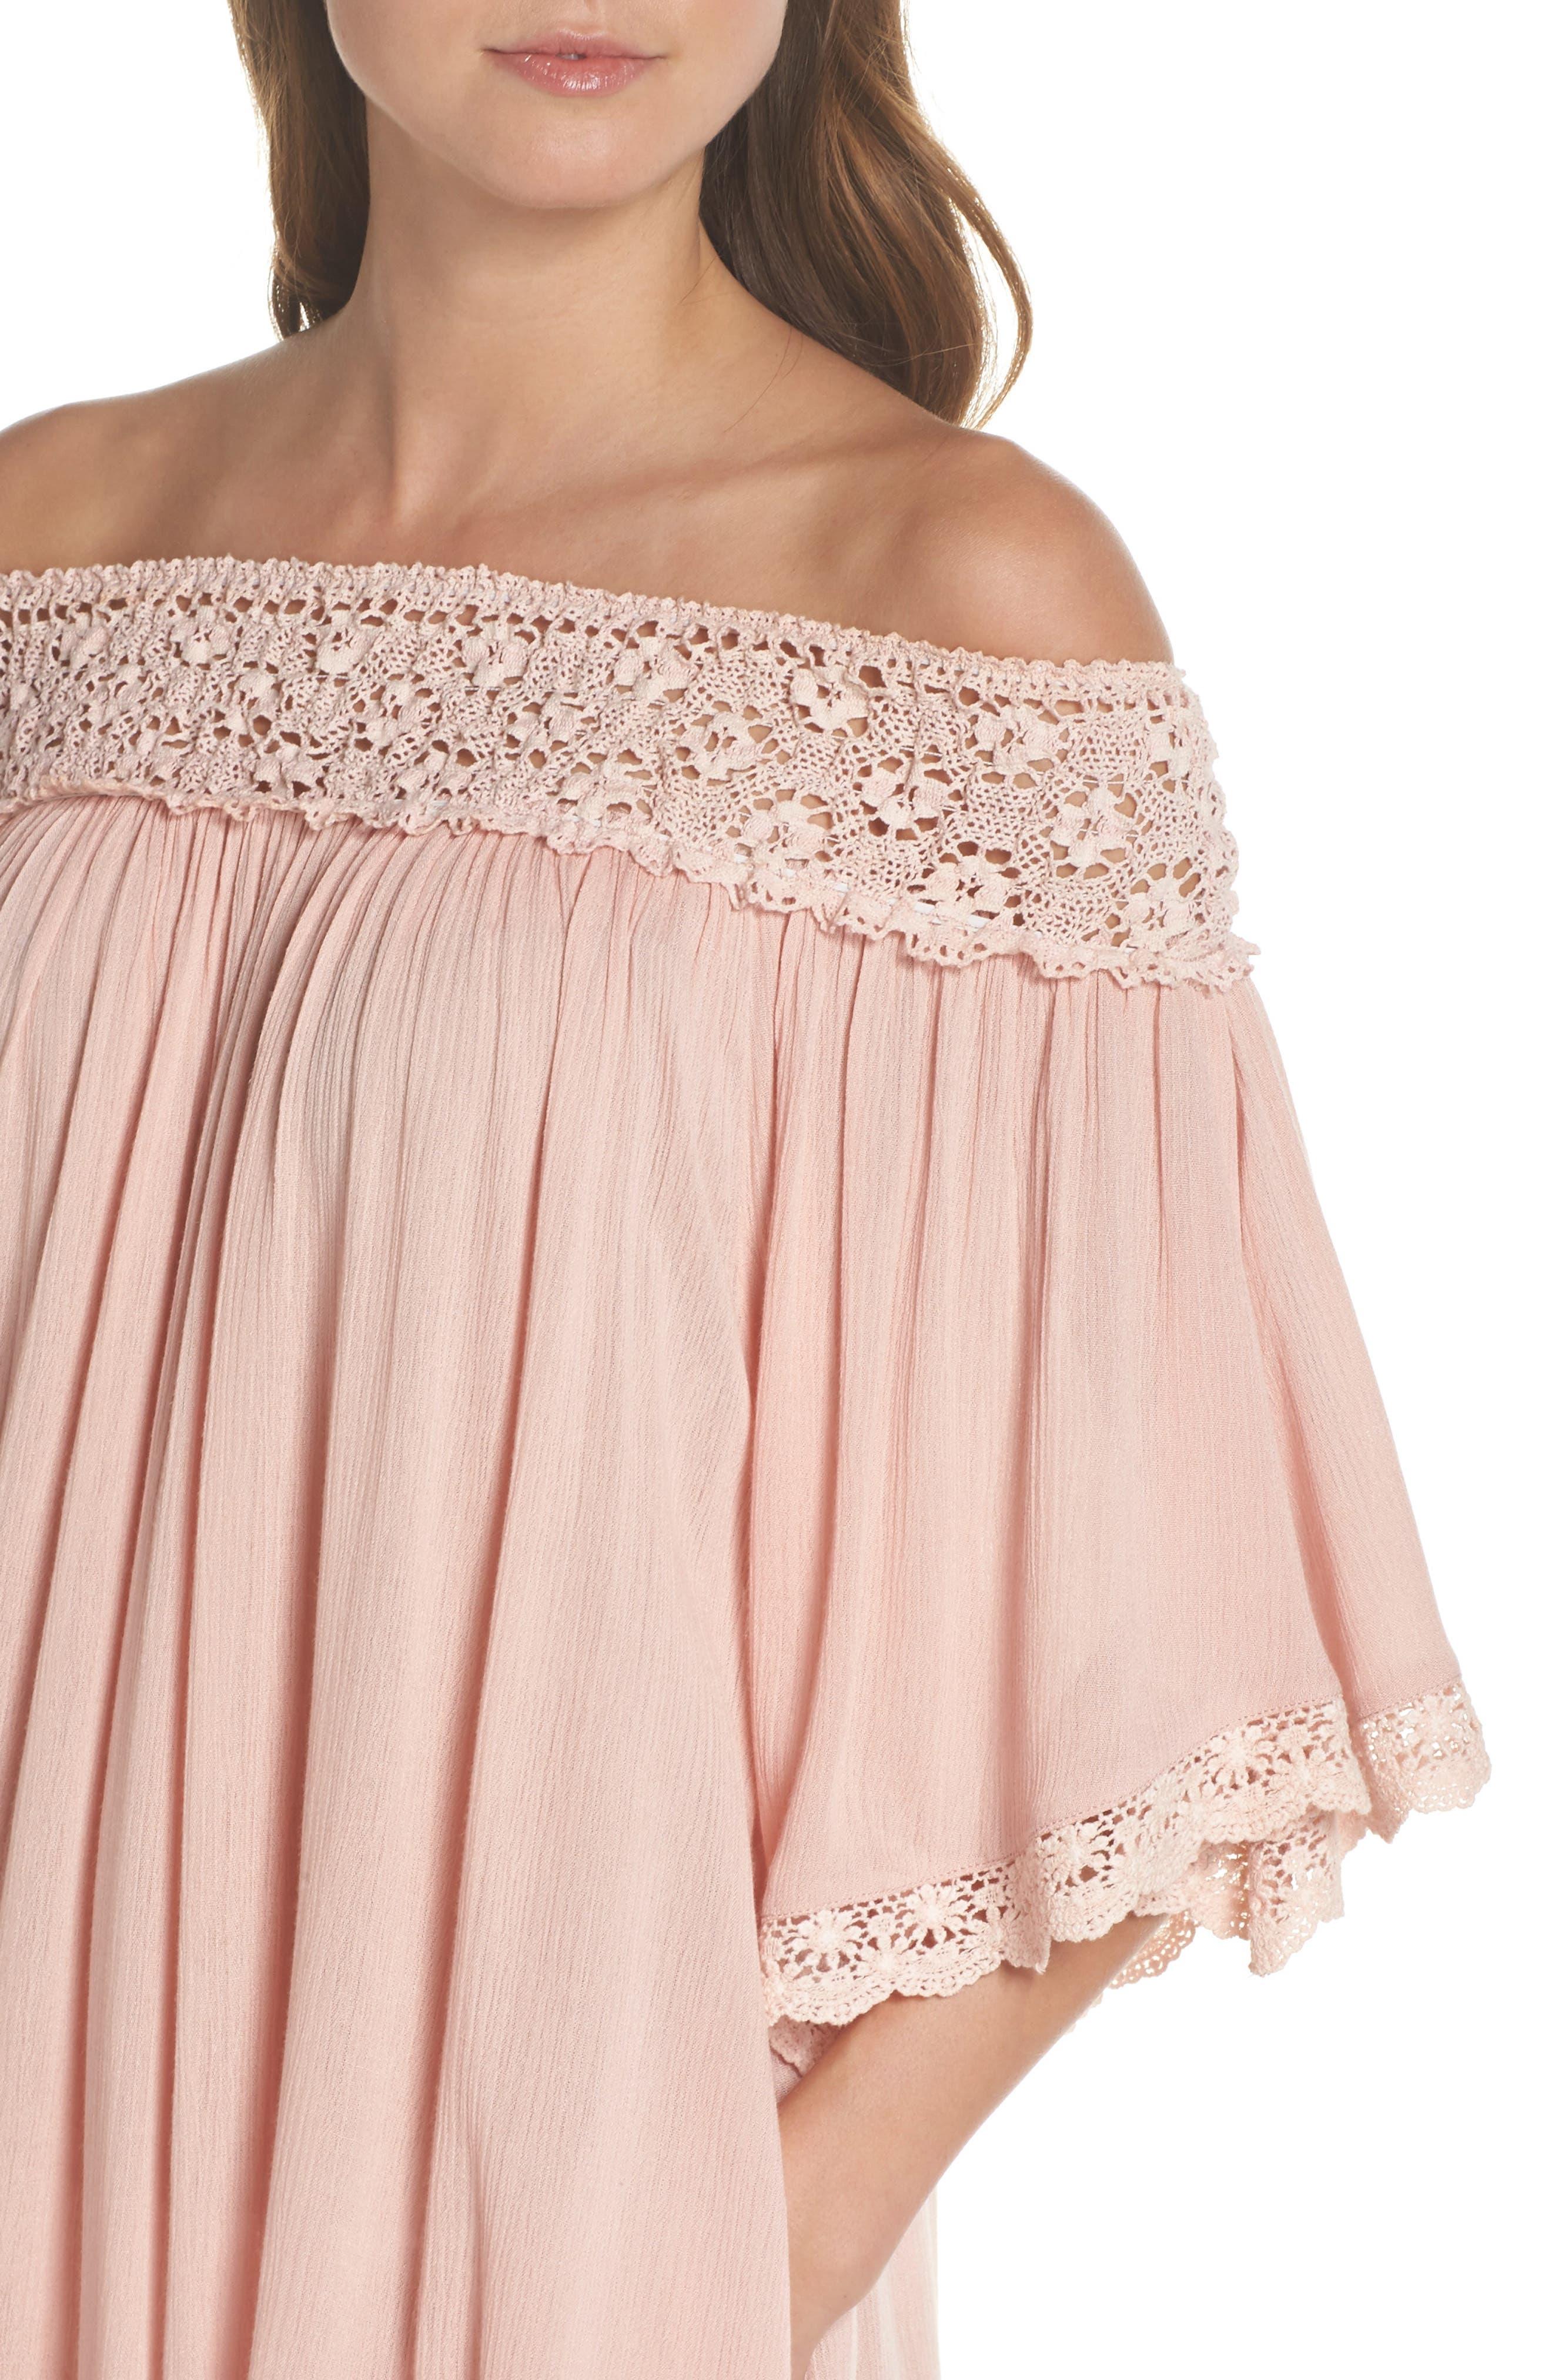 Rimini Crochet Cover-Up Dress,                             Alternate thumbnail 8, color,